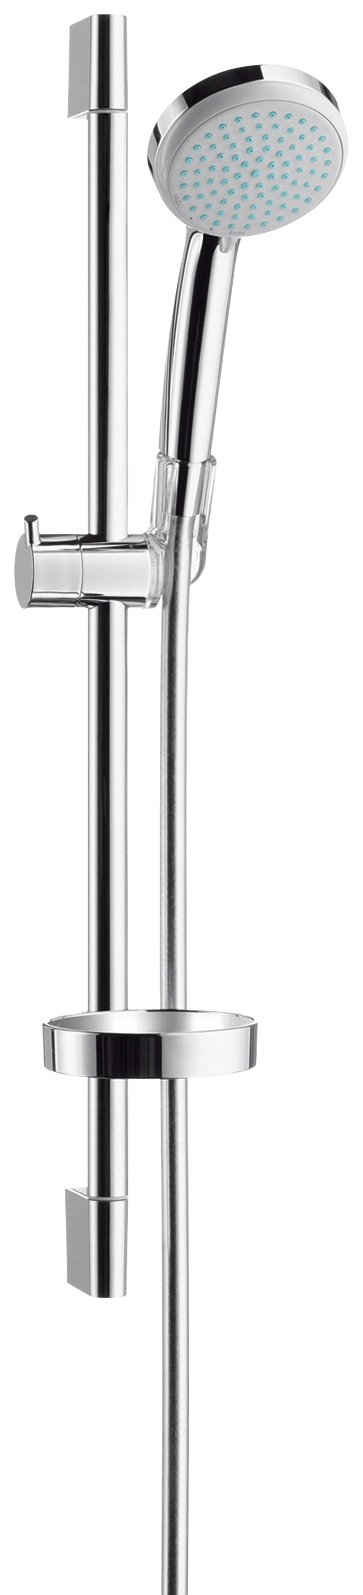 hansgrohe Brausegarnitur »Croma 100 Vario«, Höhe 65 cm, 1/2 Zoll